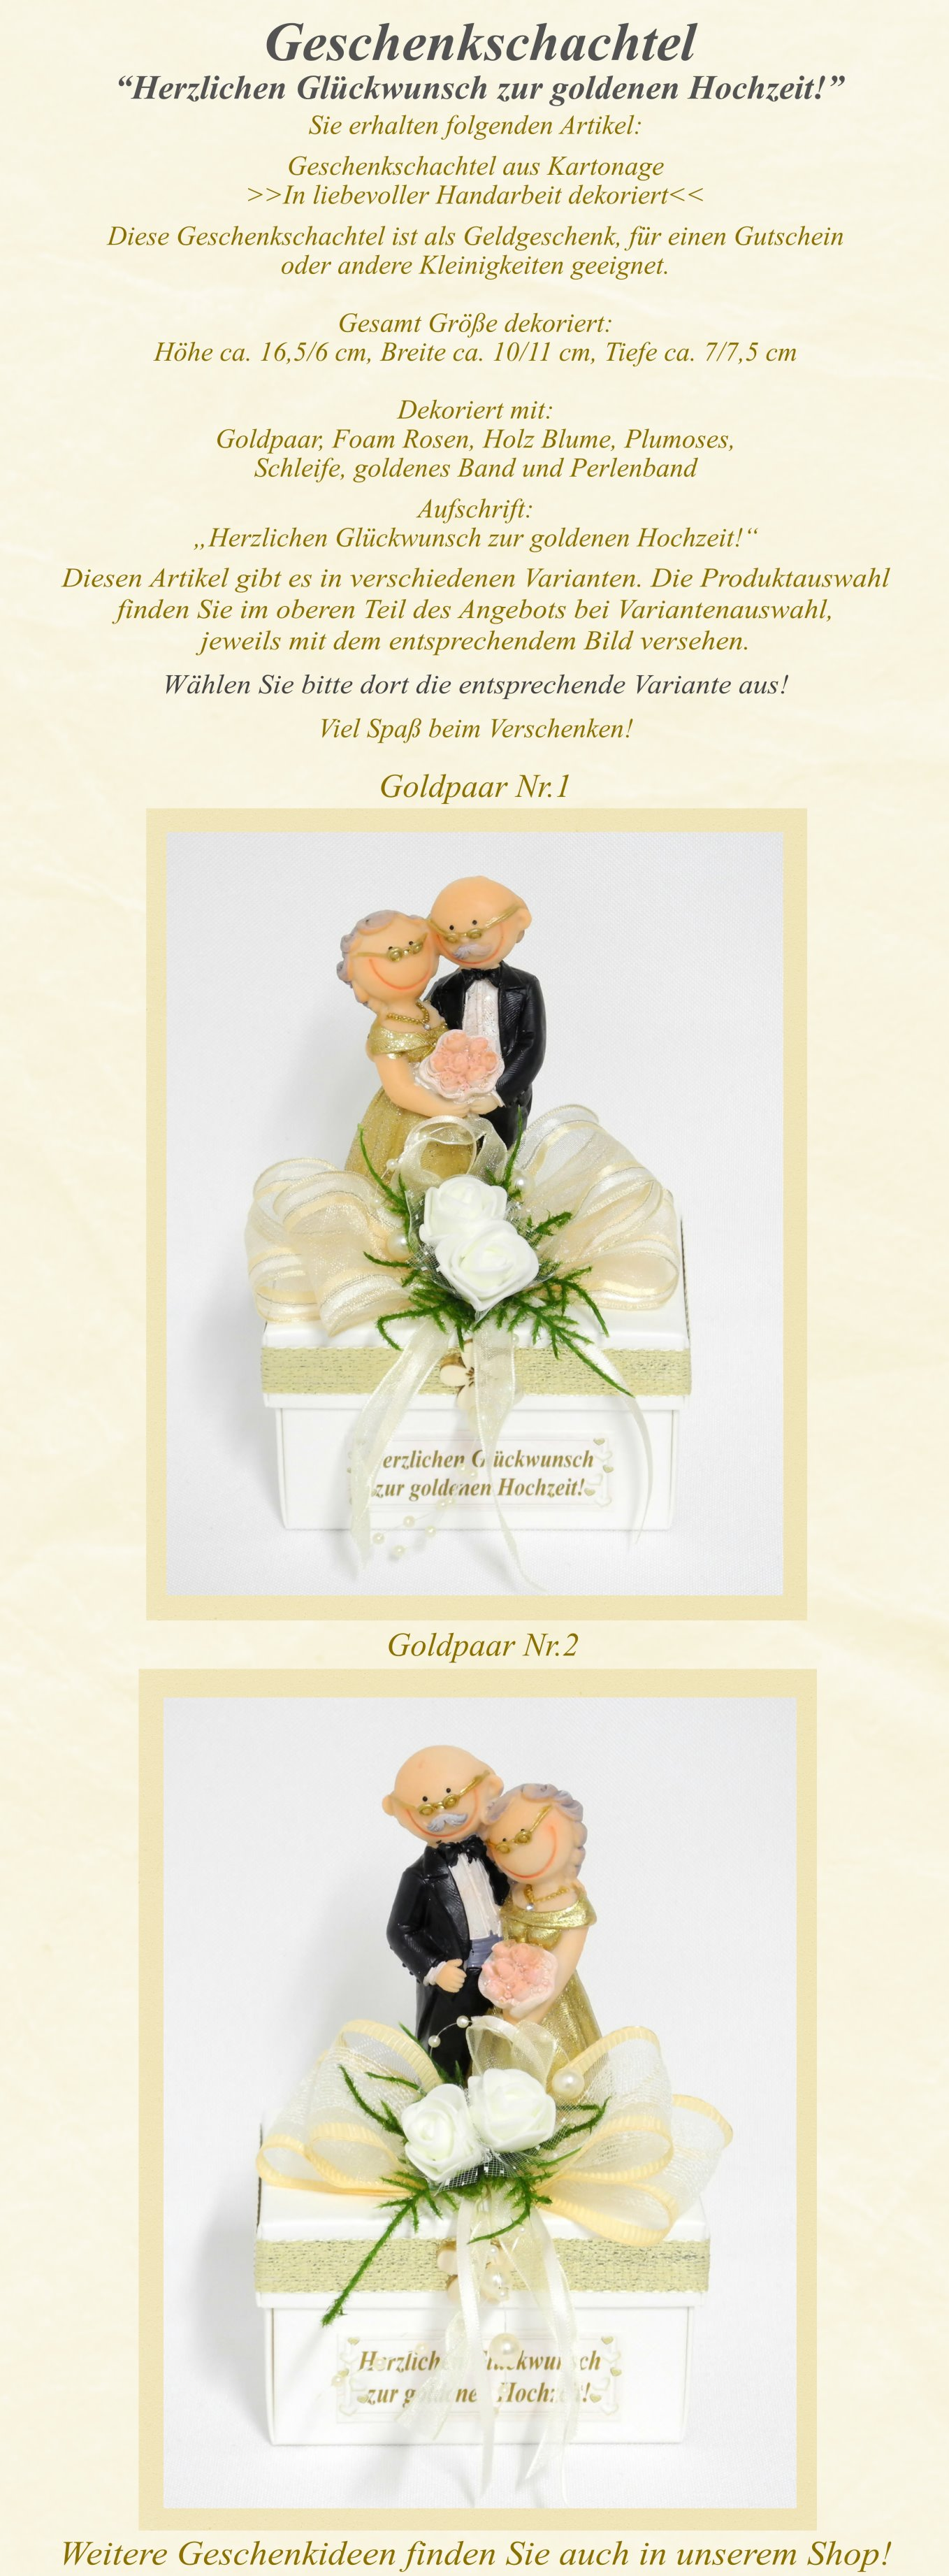 Details Zu Geschenkschachtel Geschenkbox Goldene Hochzeit Goldpaar Geldgeschenk